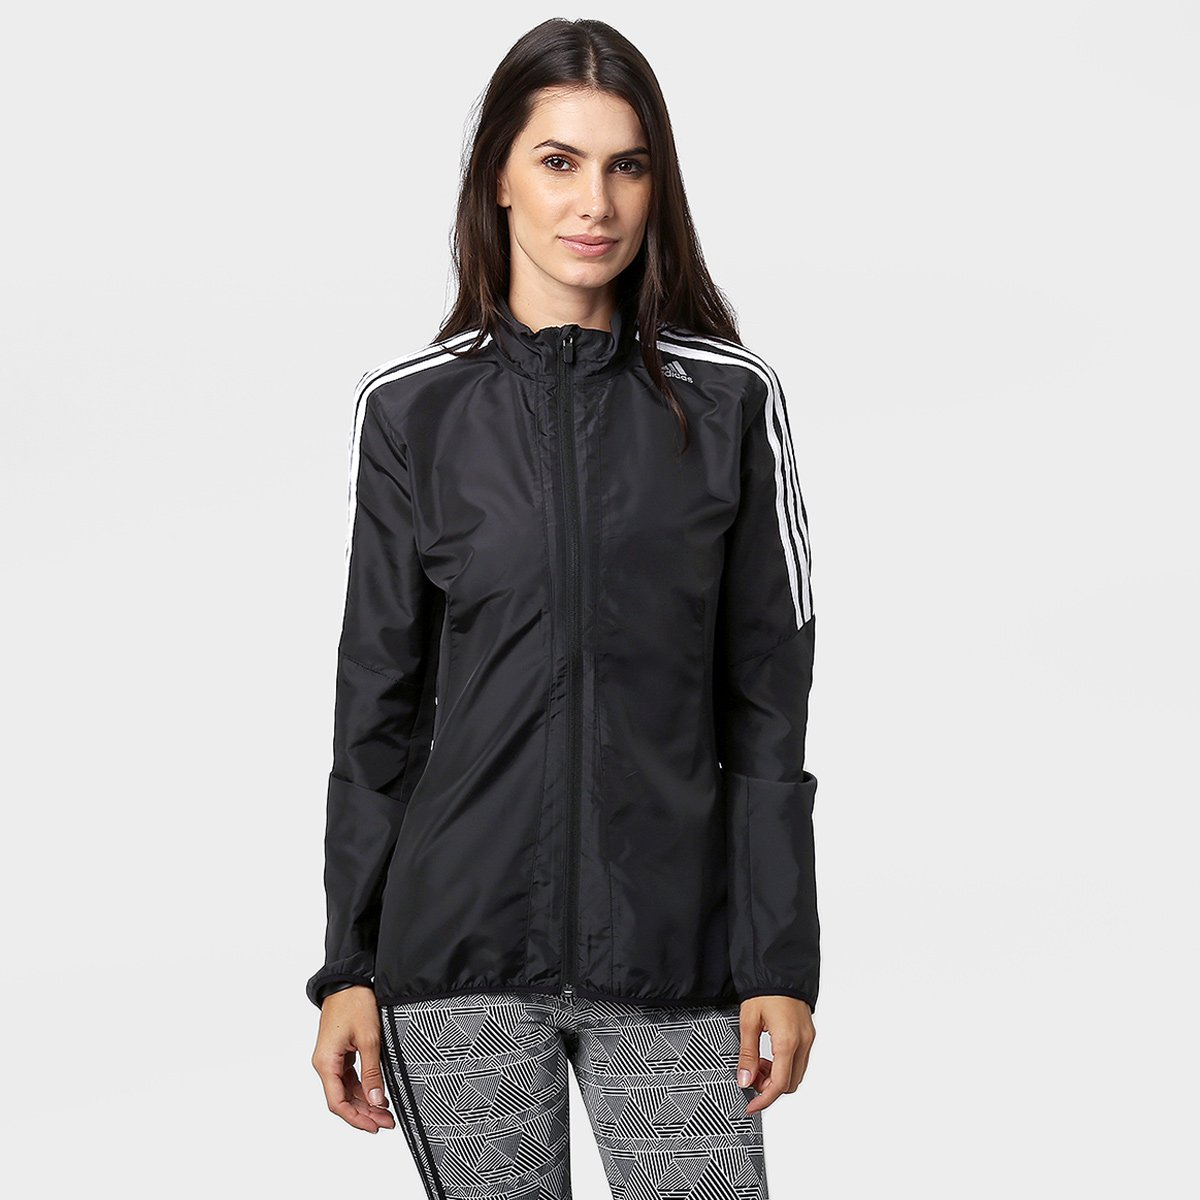 Jaqueta Adidas Response